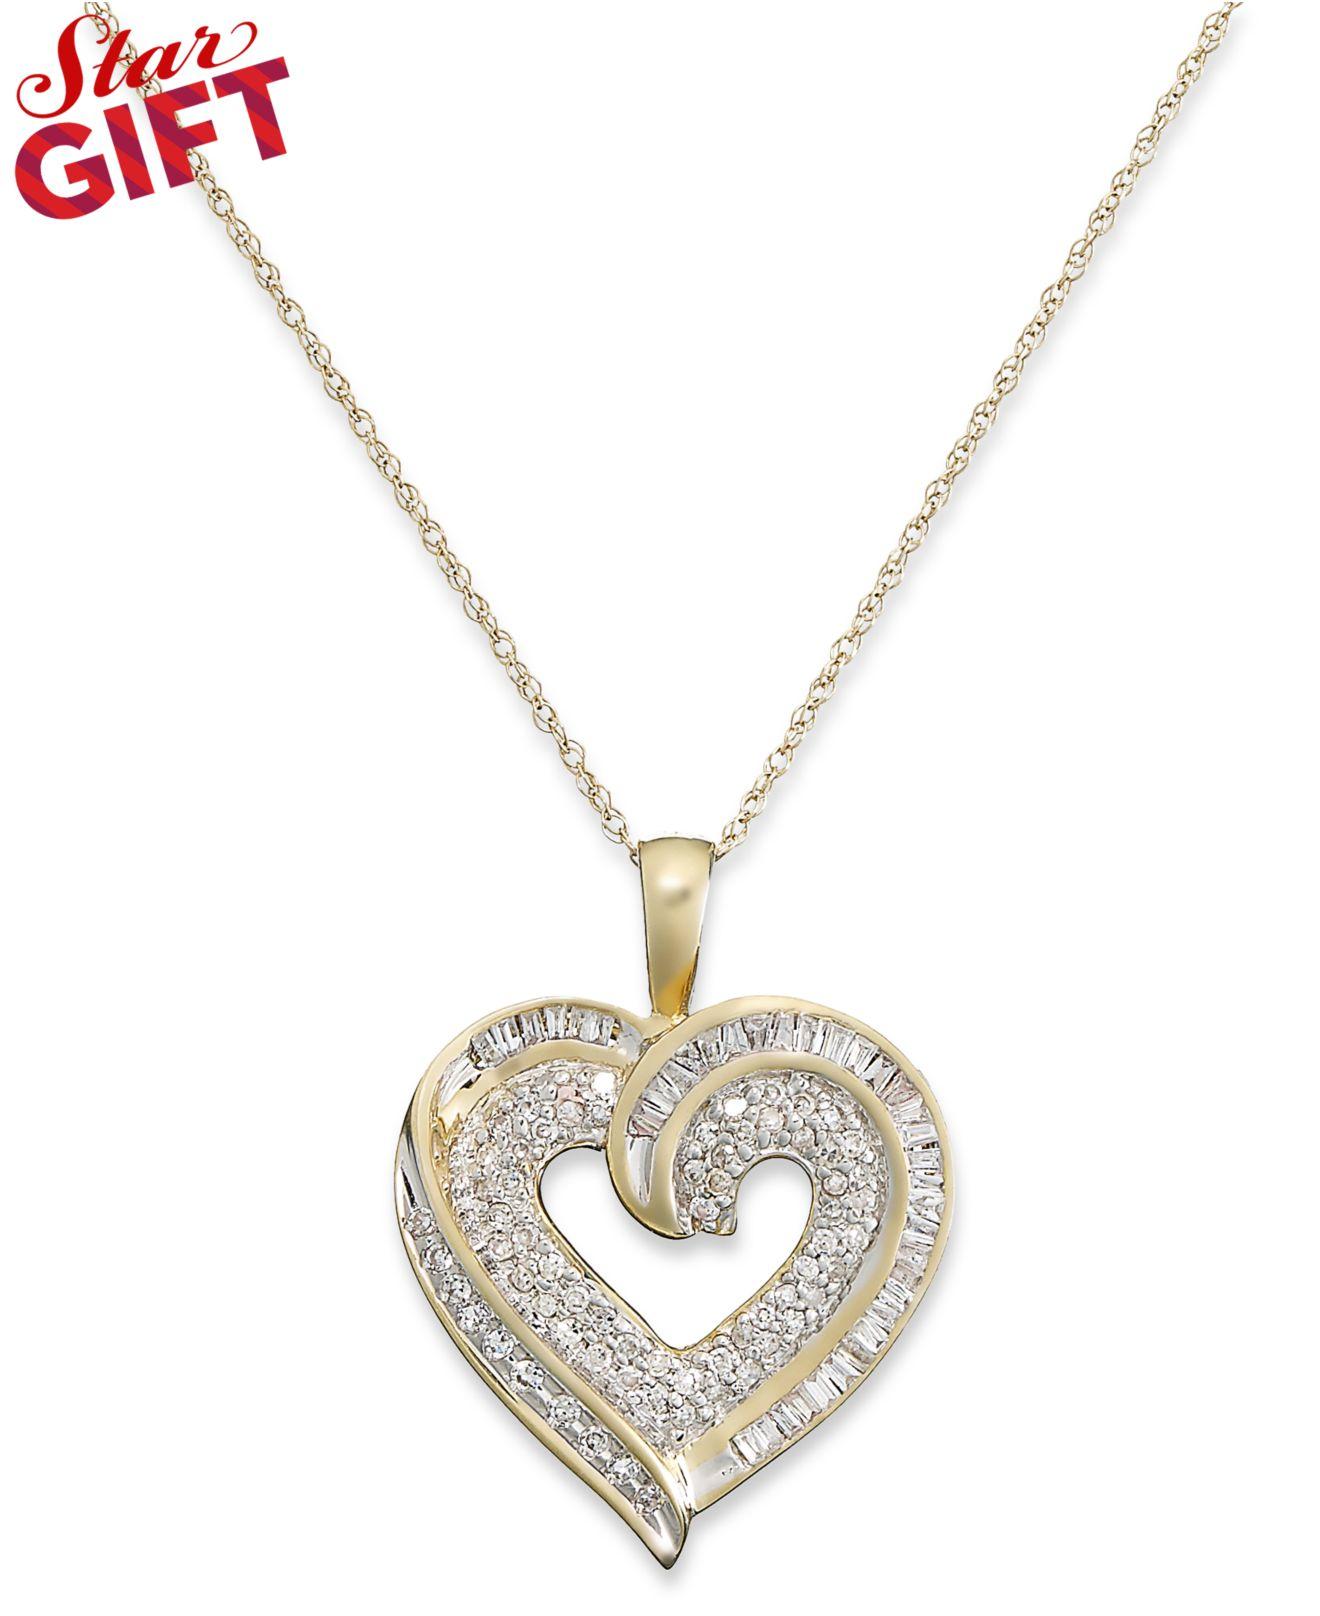 Ct White Gold Diamond Heart Necklace